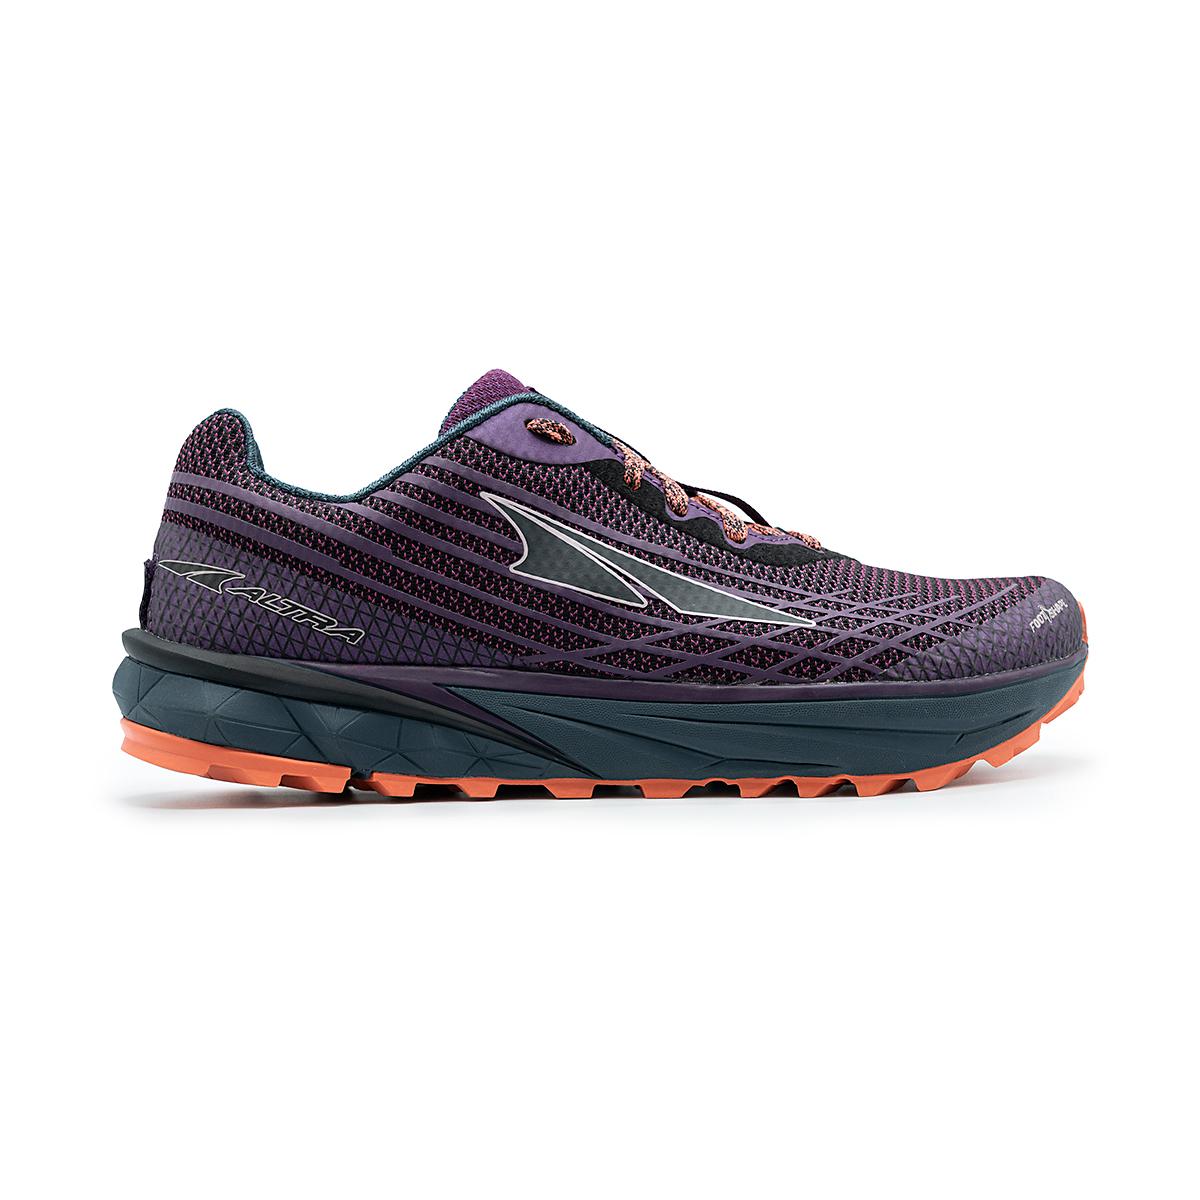 Women's Altra Timp 2 Running Shoe - Color: Plum/Coral - Size: 5.5 - Width: Regular, Plum/Coral, large, image 1